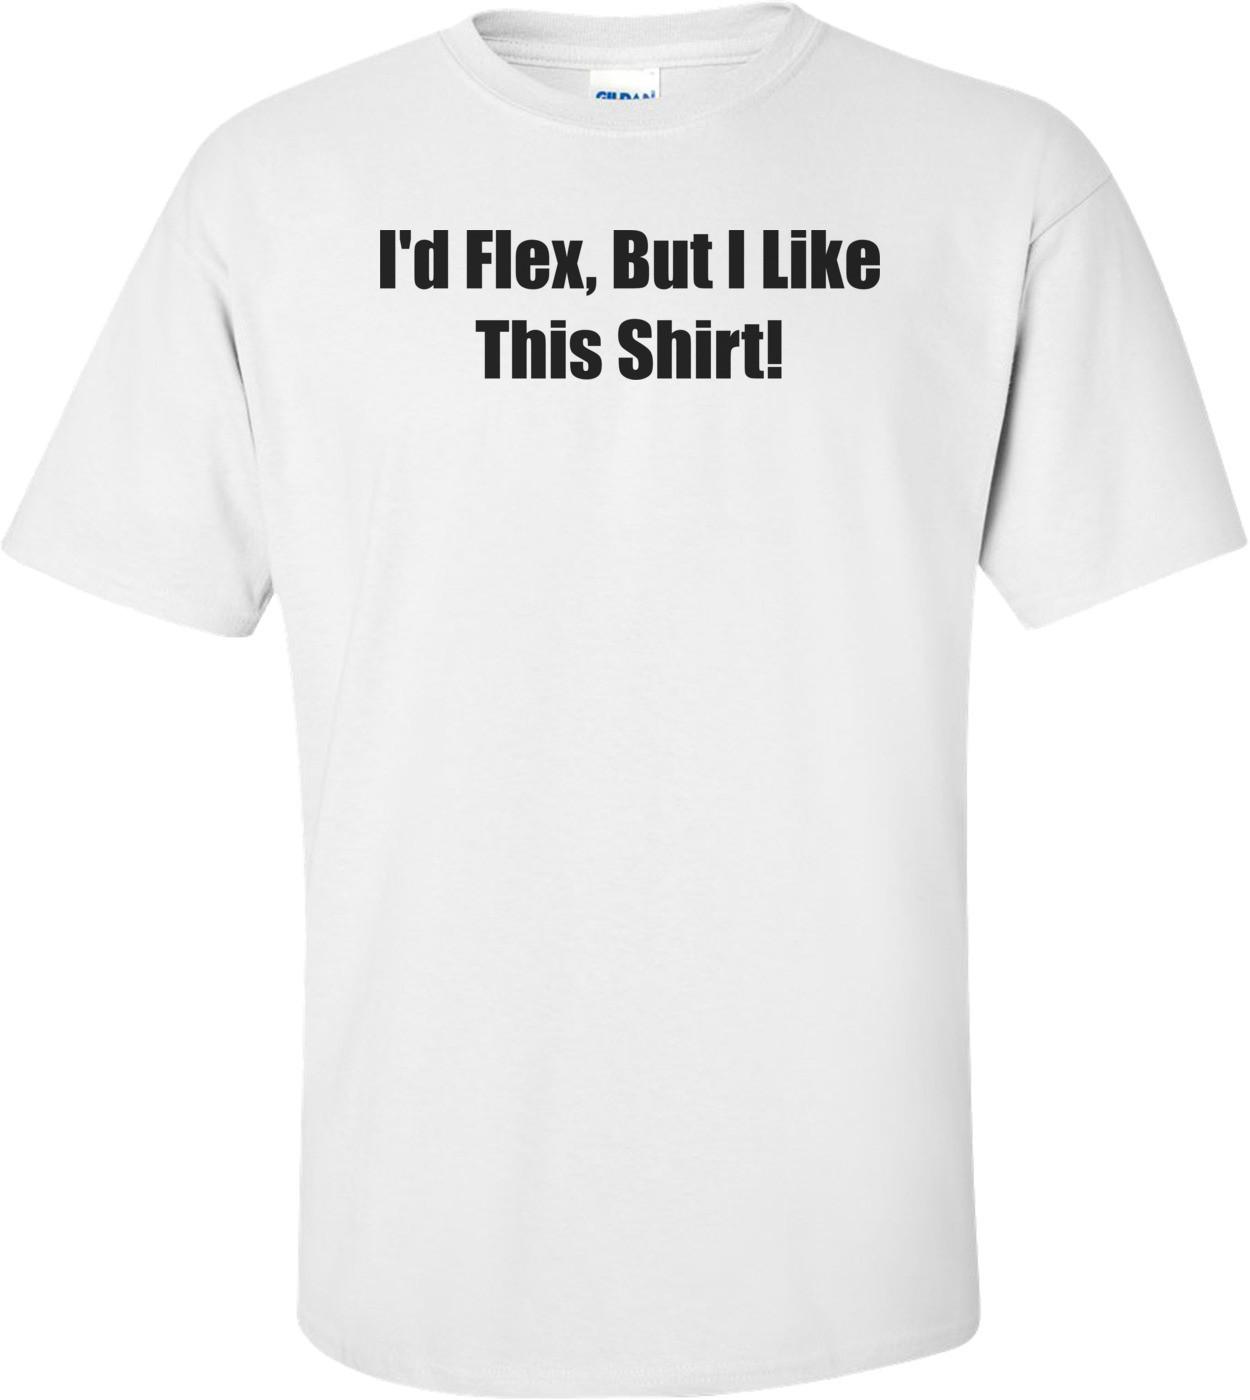 I'd Flex, But I Like This Shirt! T-Shirt